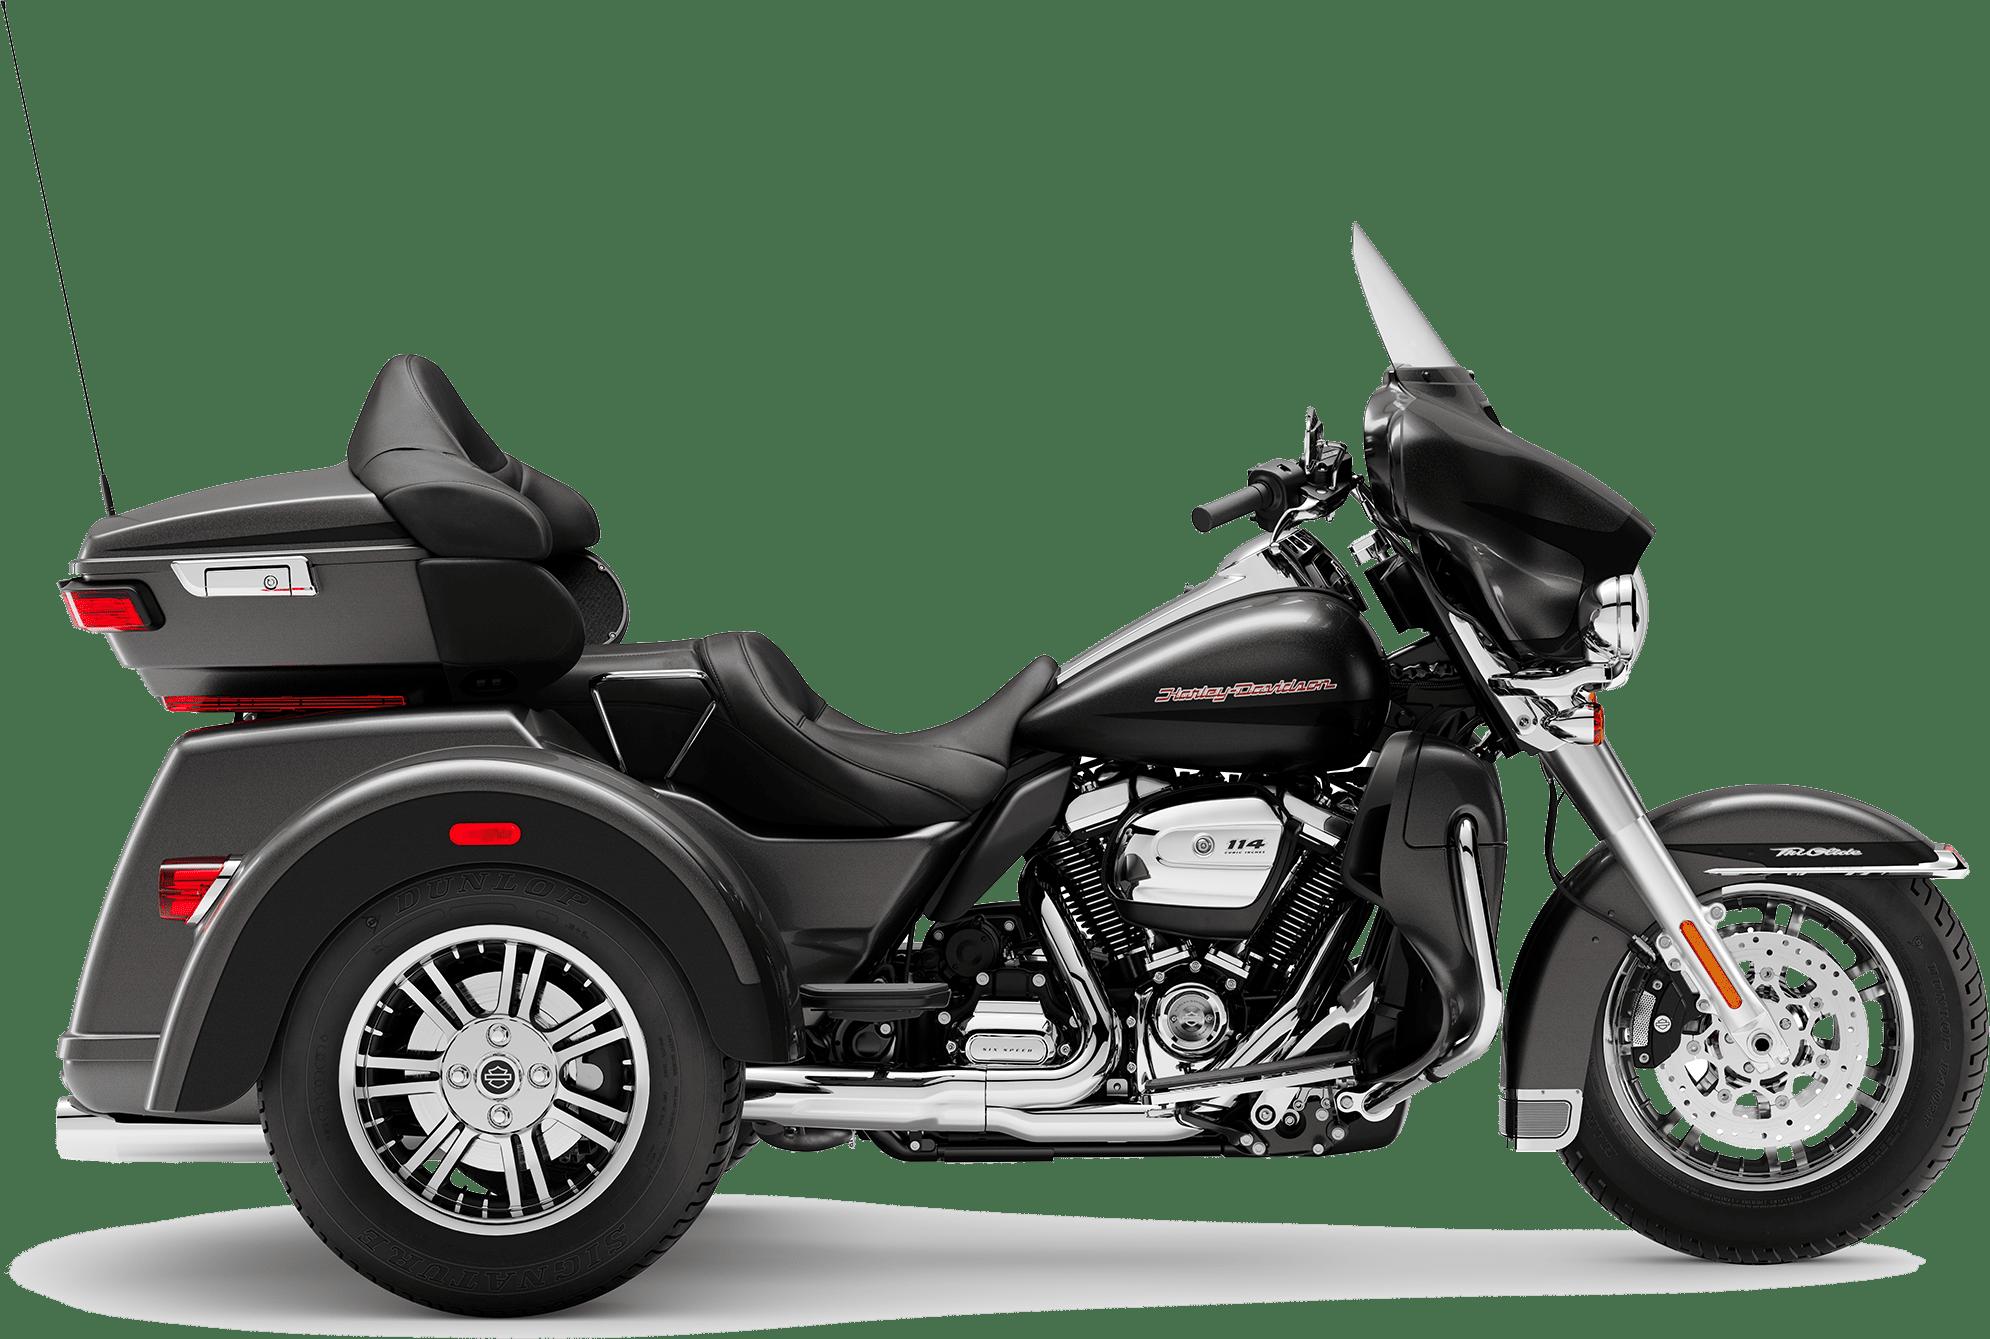 2019 Harley-Davidson Tri-Glide Ultra Silver Flux Black Fuse